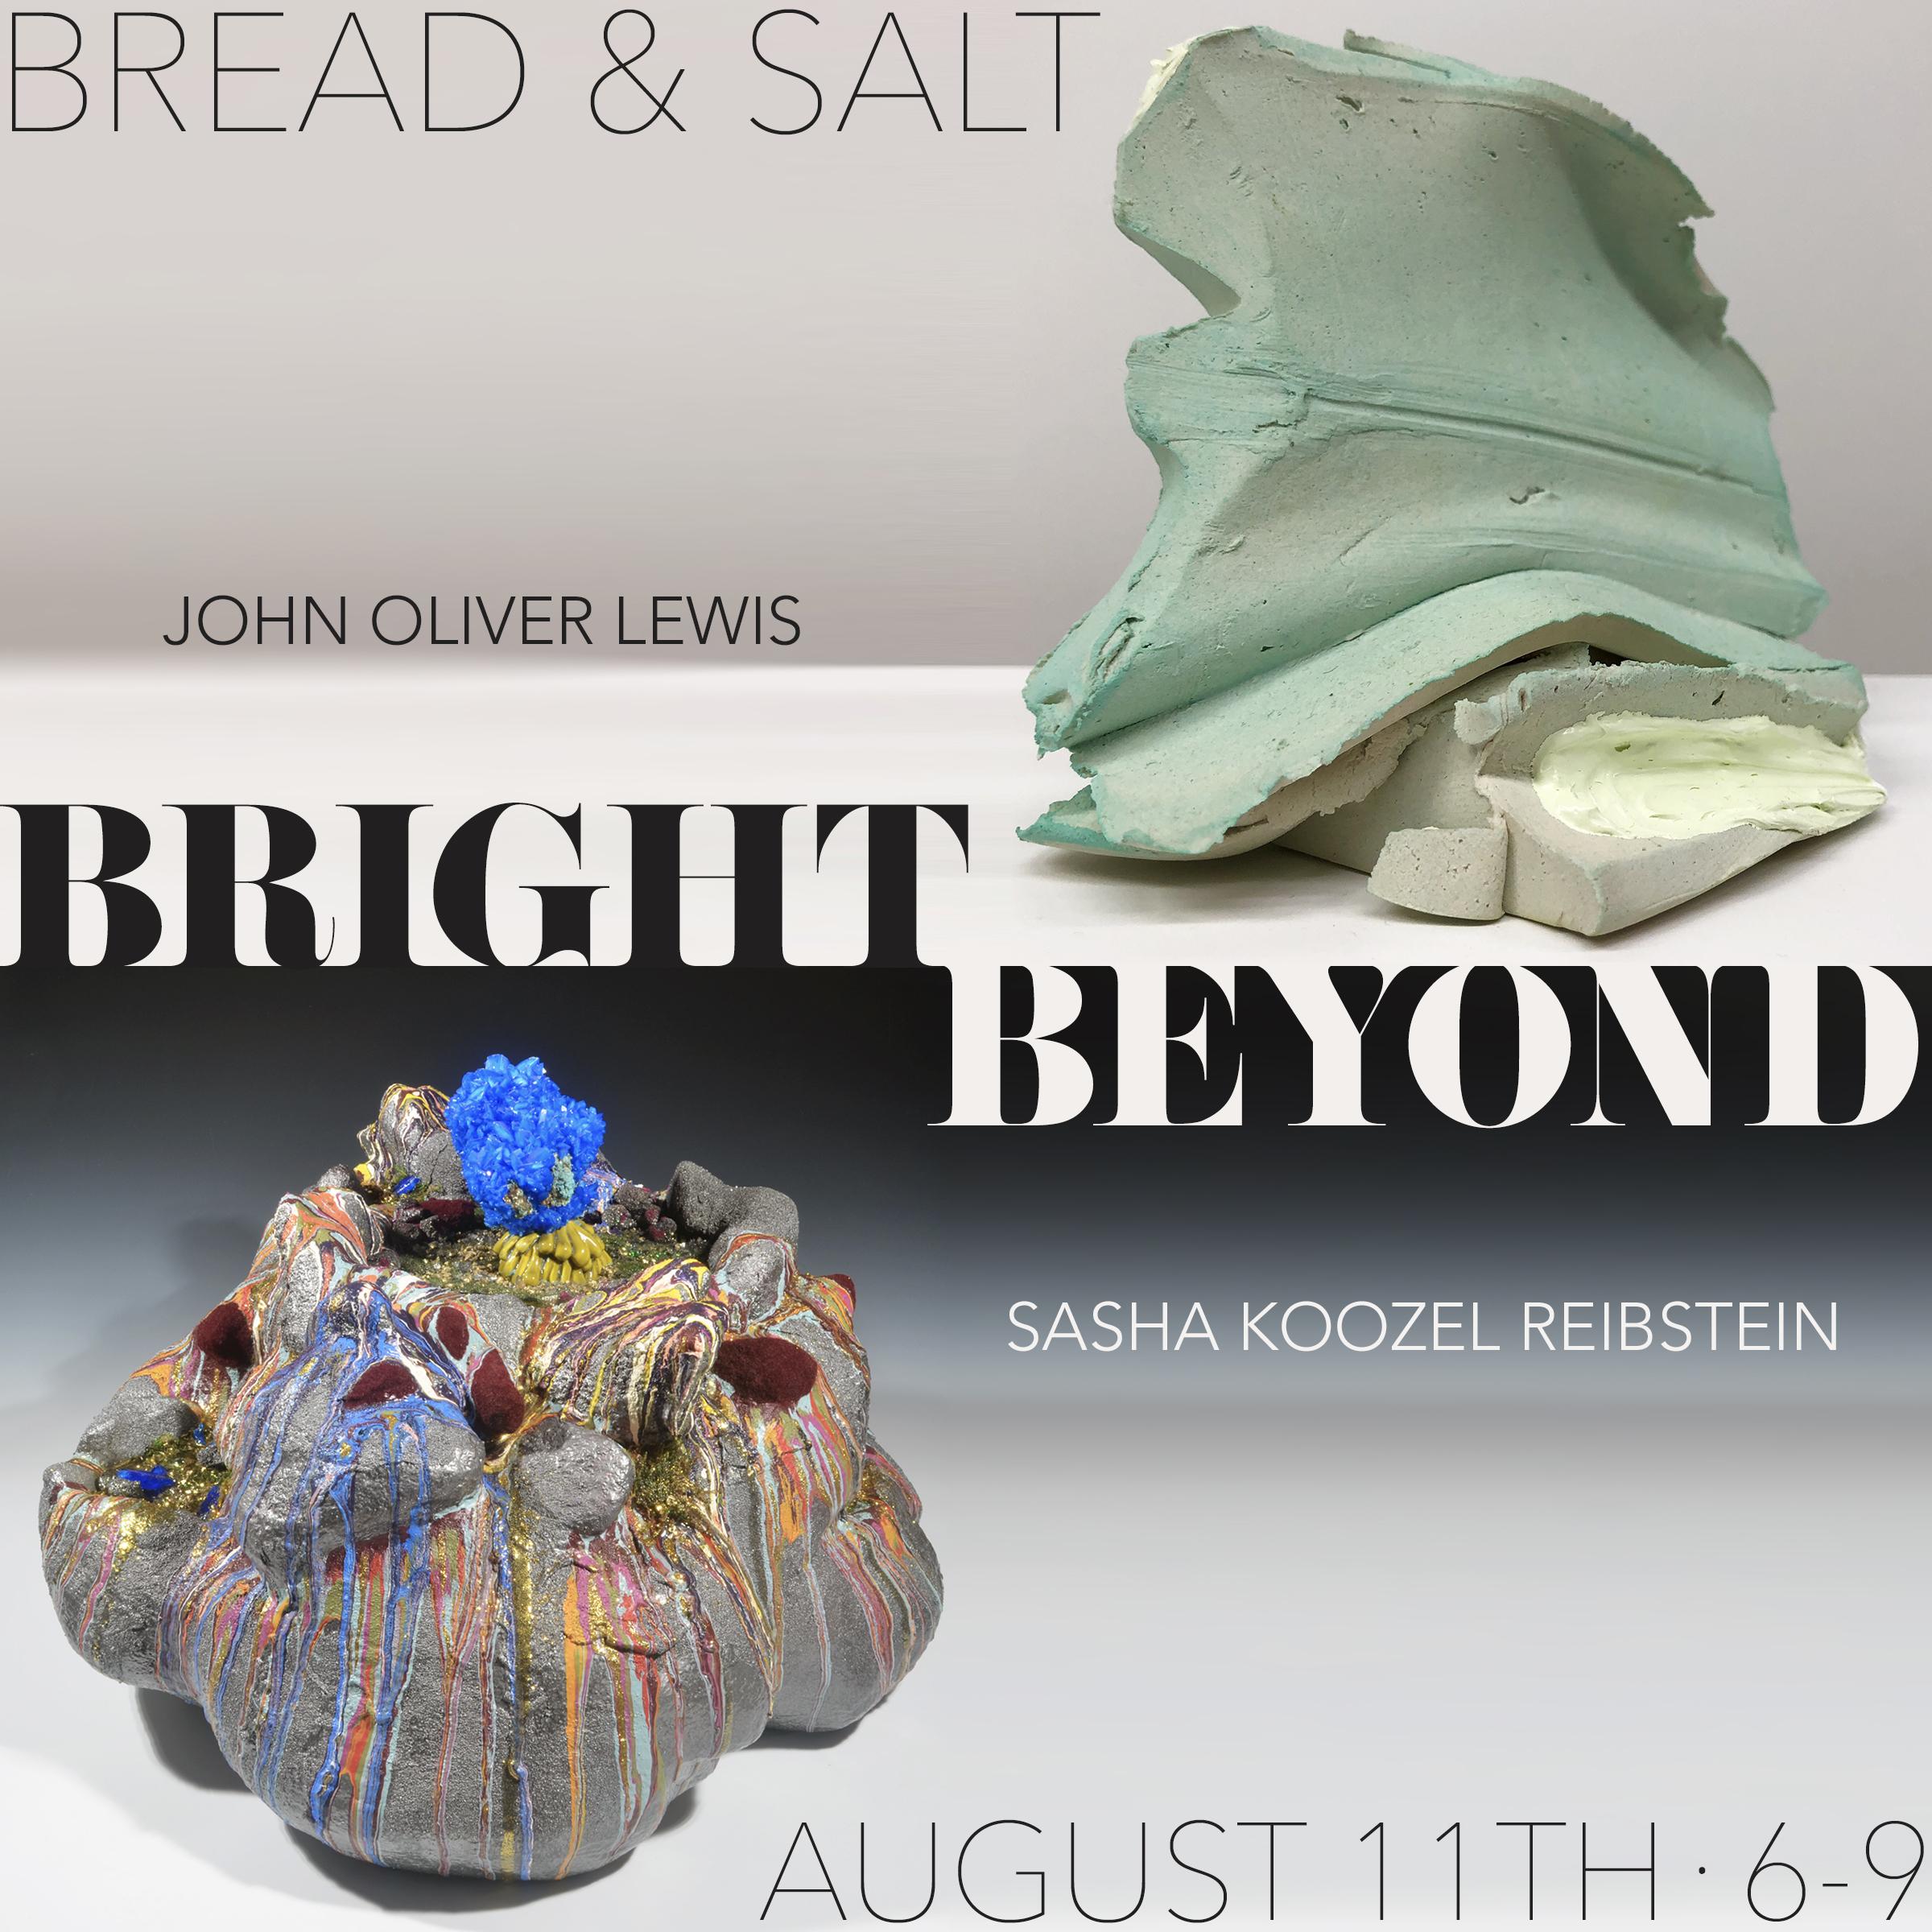 Bright Beyond Announcement.jpg